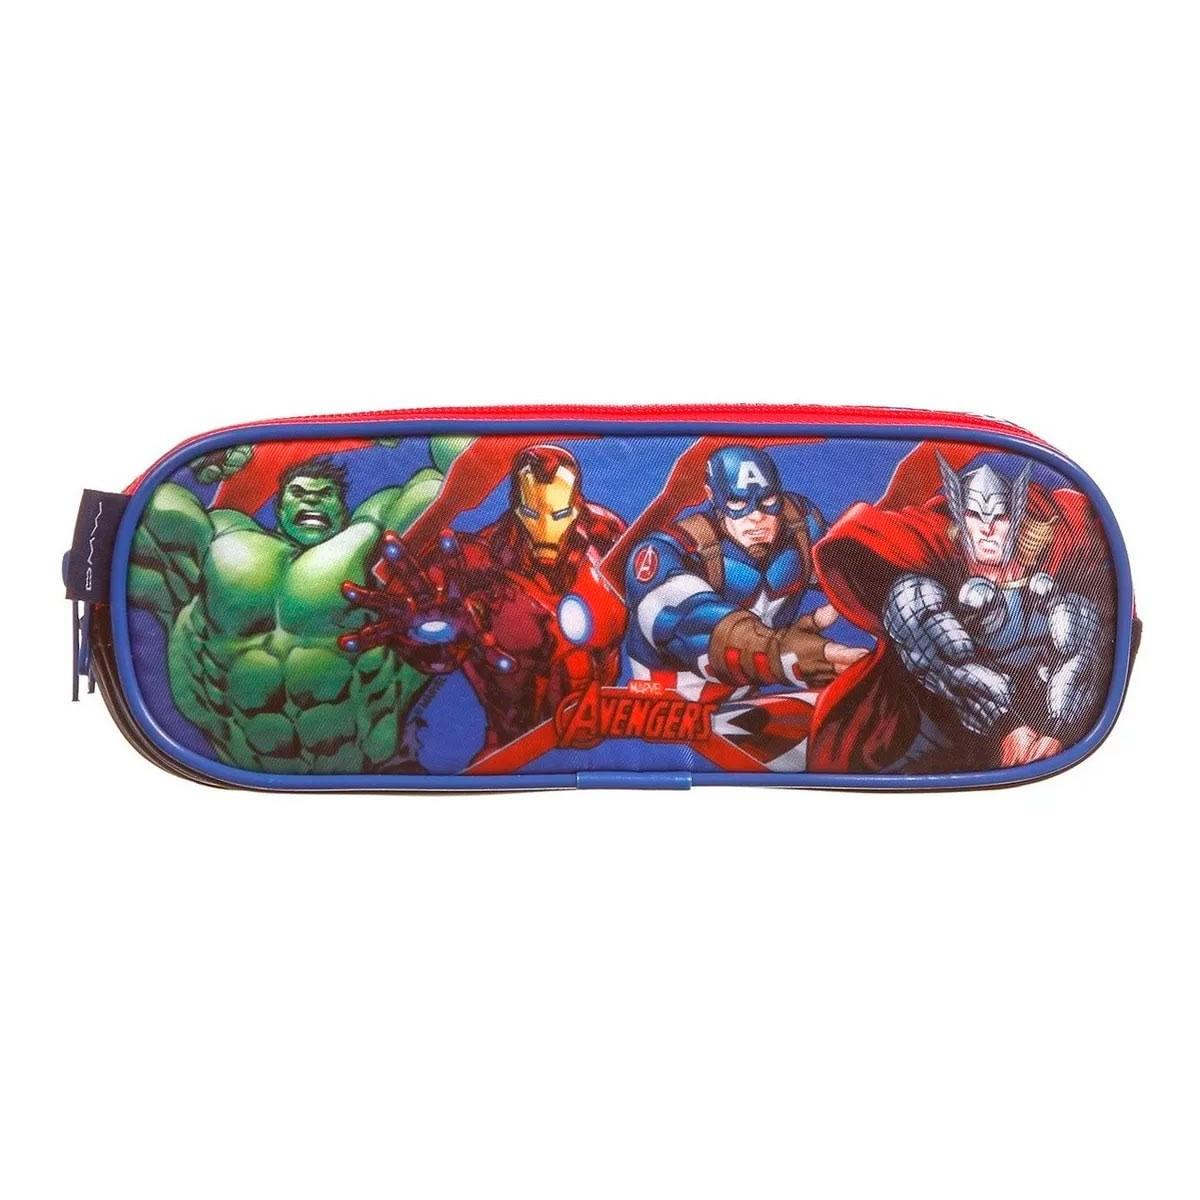 Estojo-Avengers-Soft-3-Divisoes-